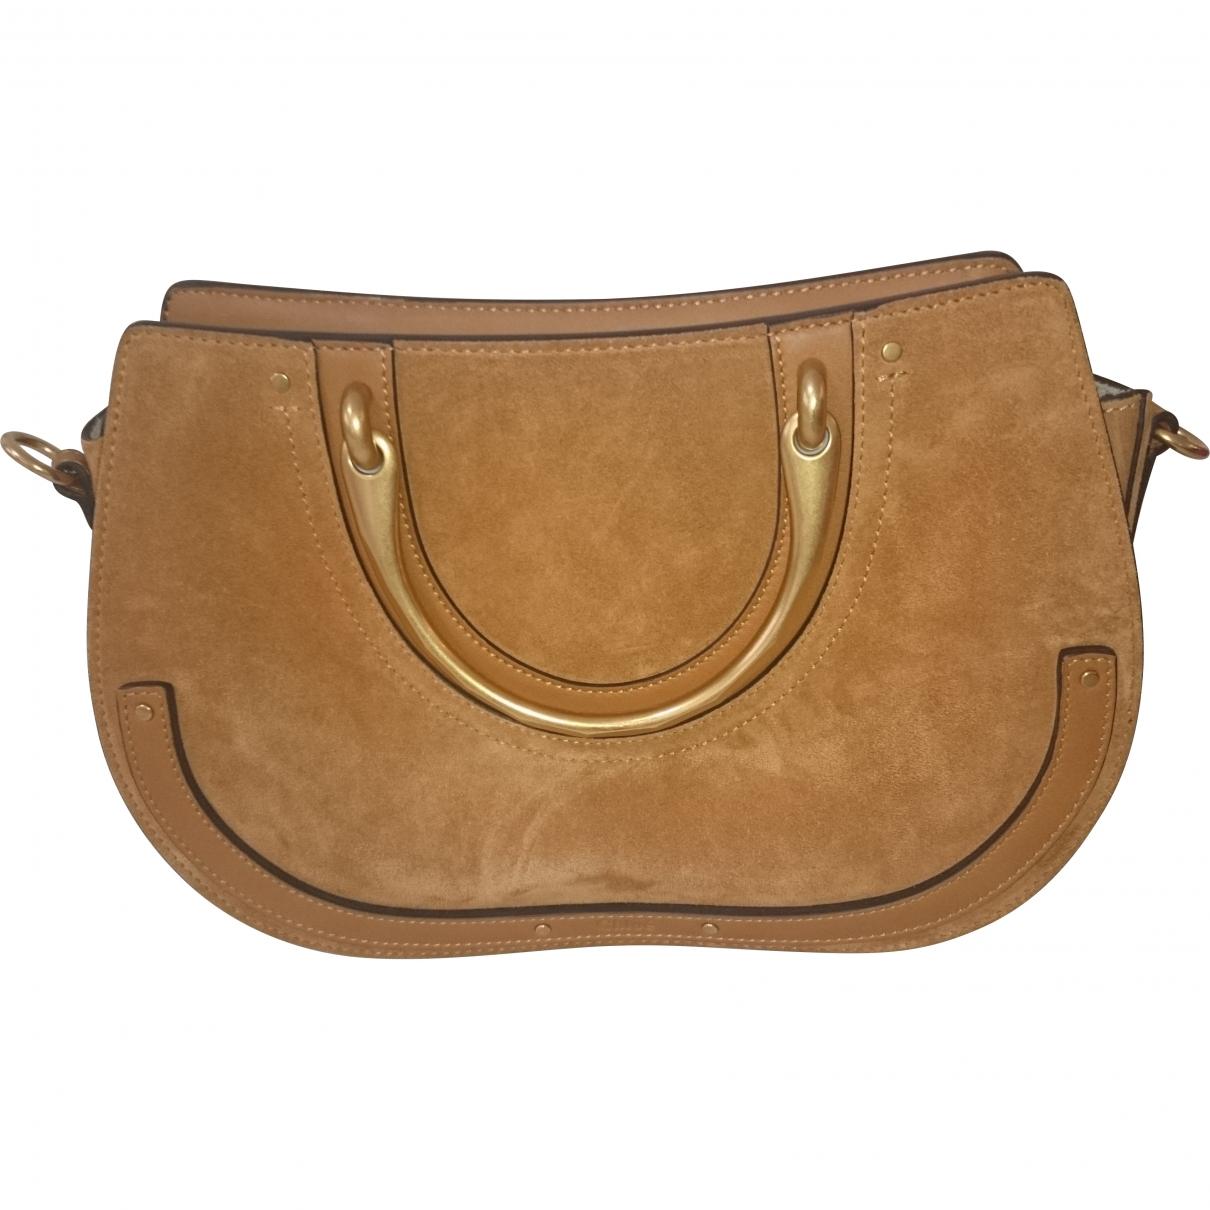 Chloé Pixie Camel Leather handbag for Women \N